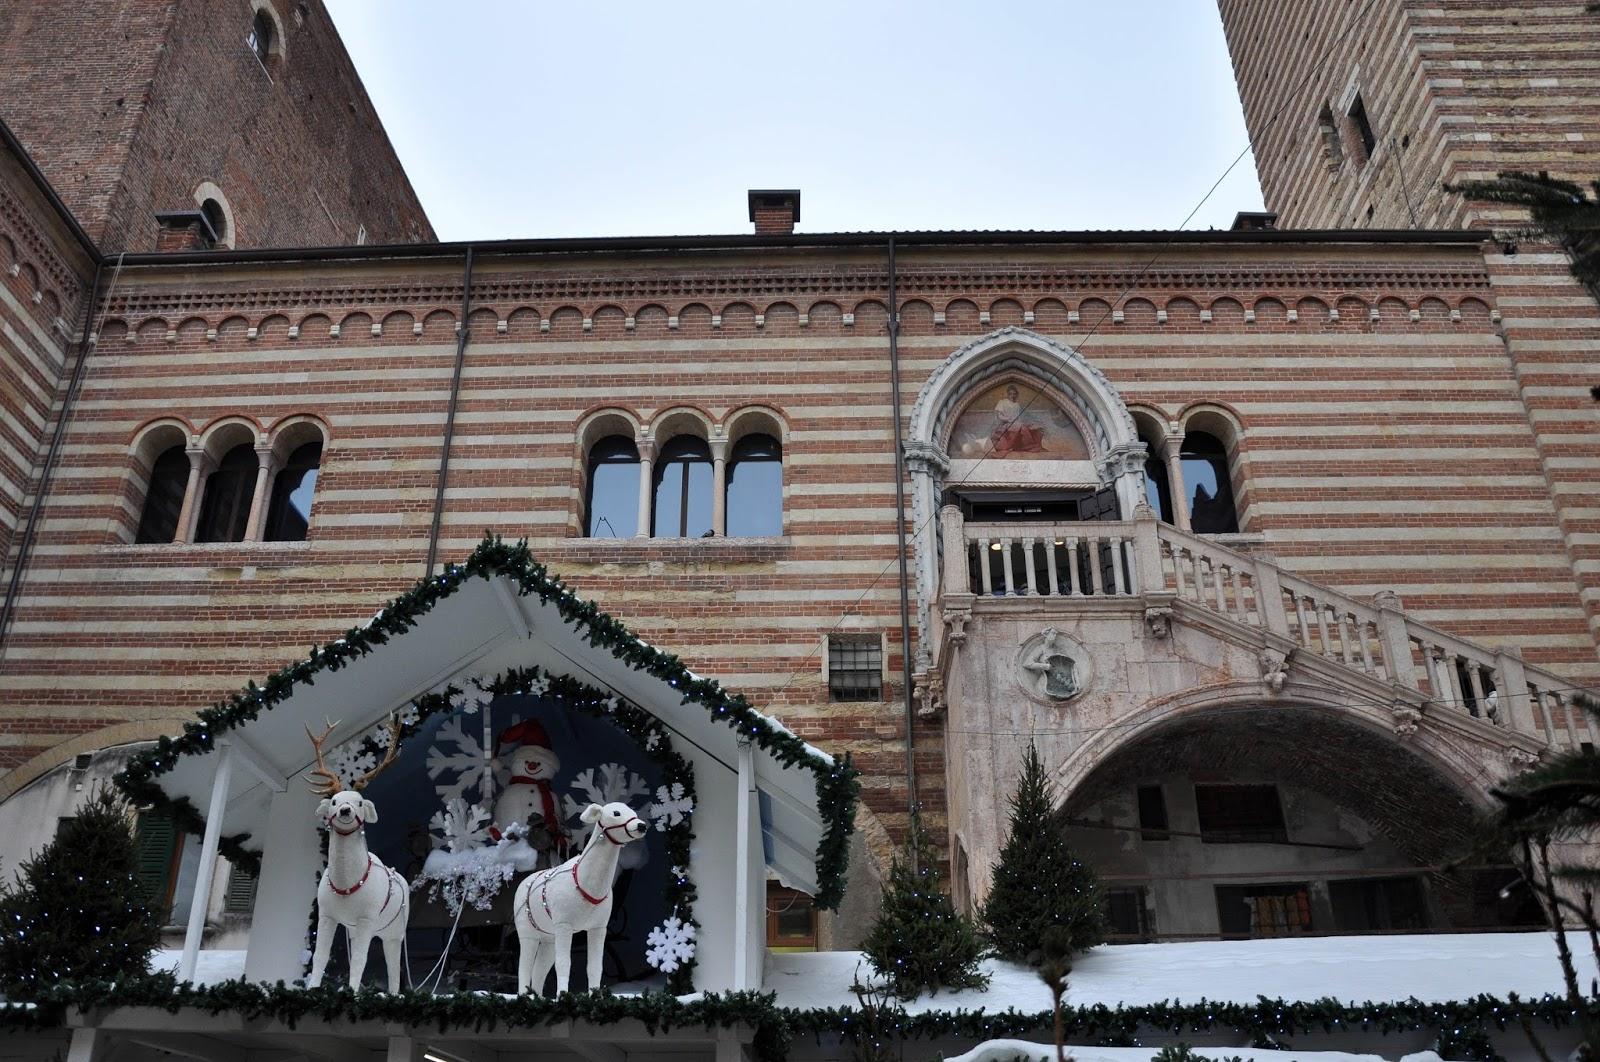 Christmas scenes, Nuremberg Christmas market, Verona, Italy